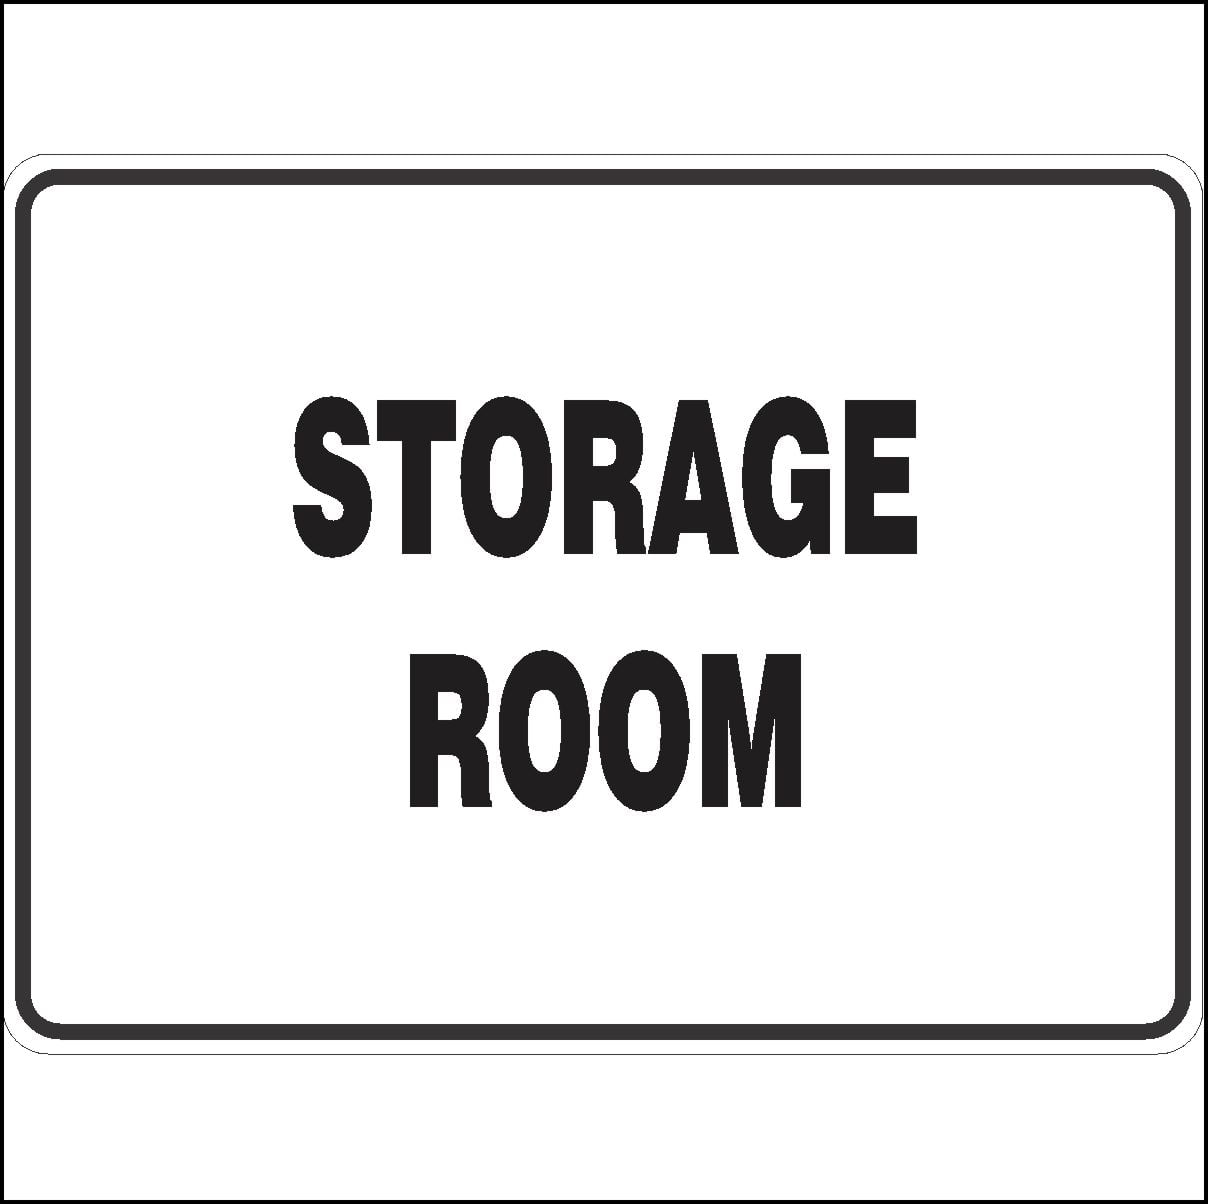 Storage Room Discount Safety Signs Australia